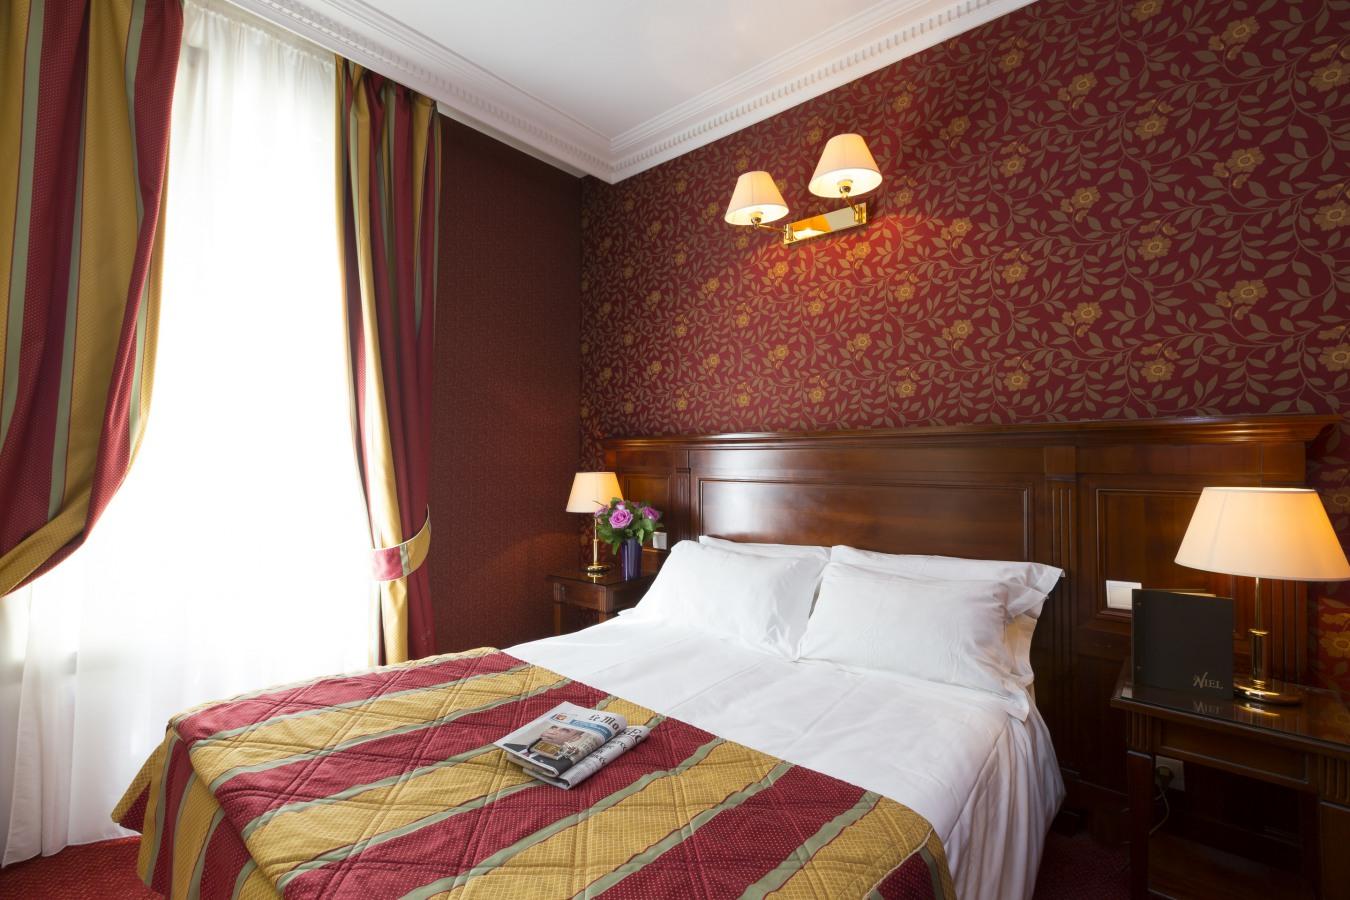 Hôtel Niel - Rooms